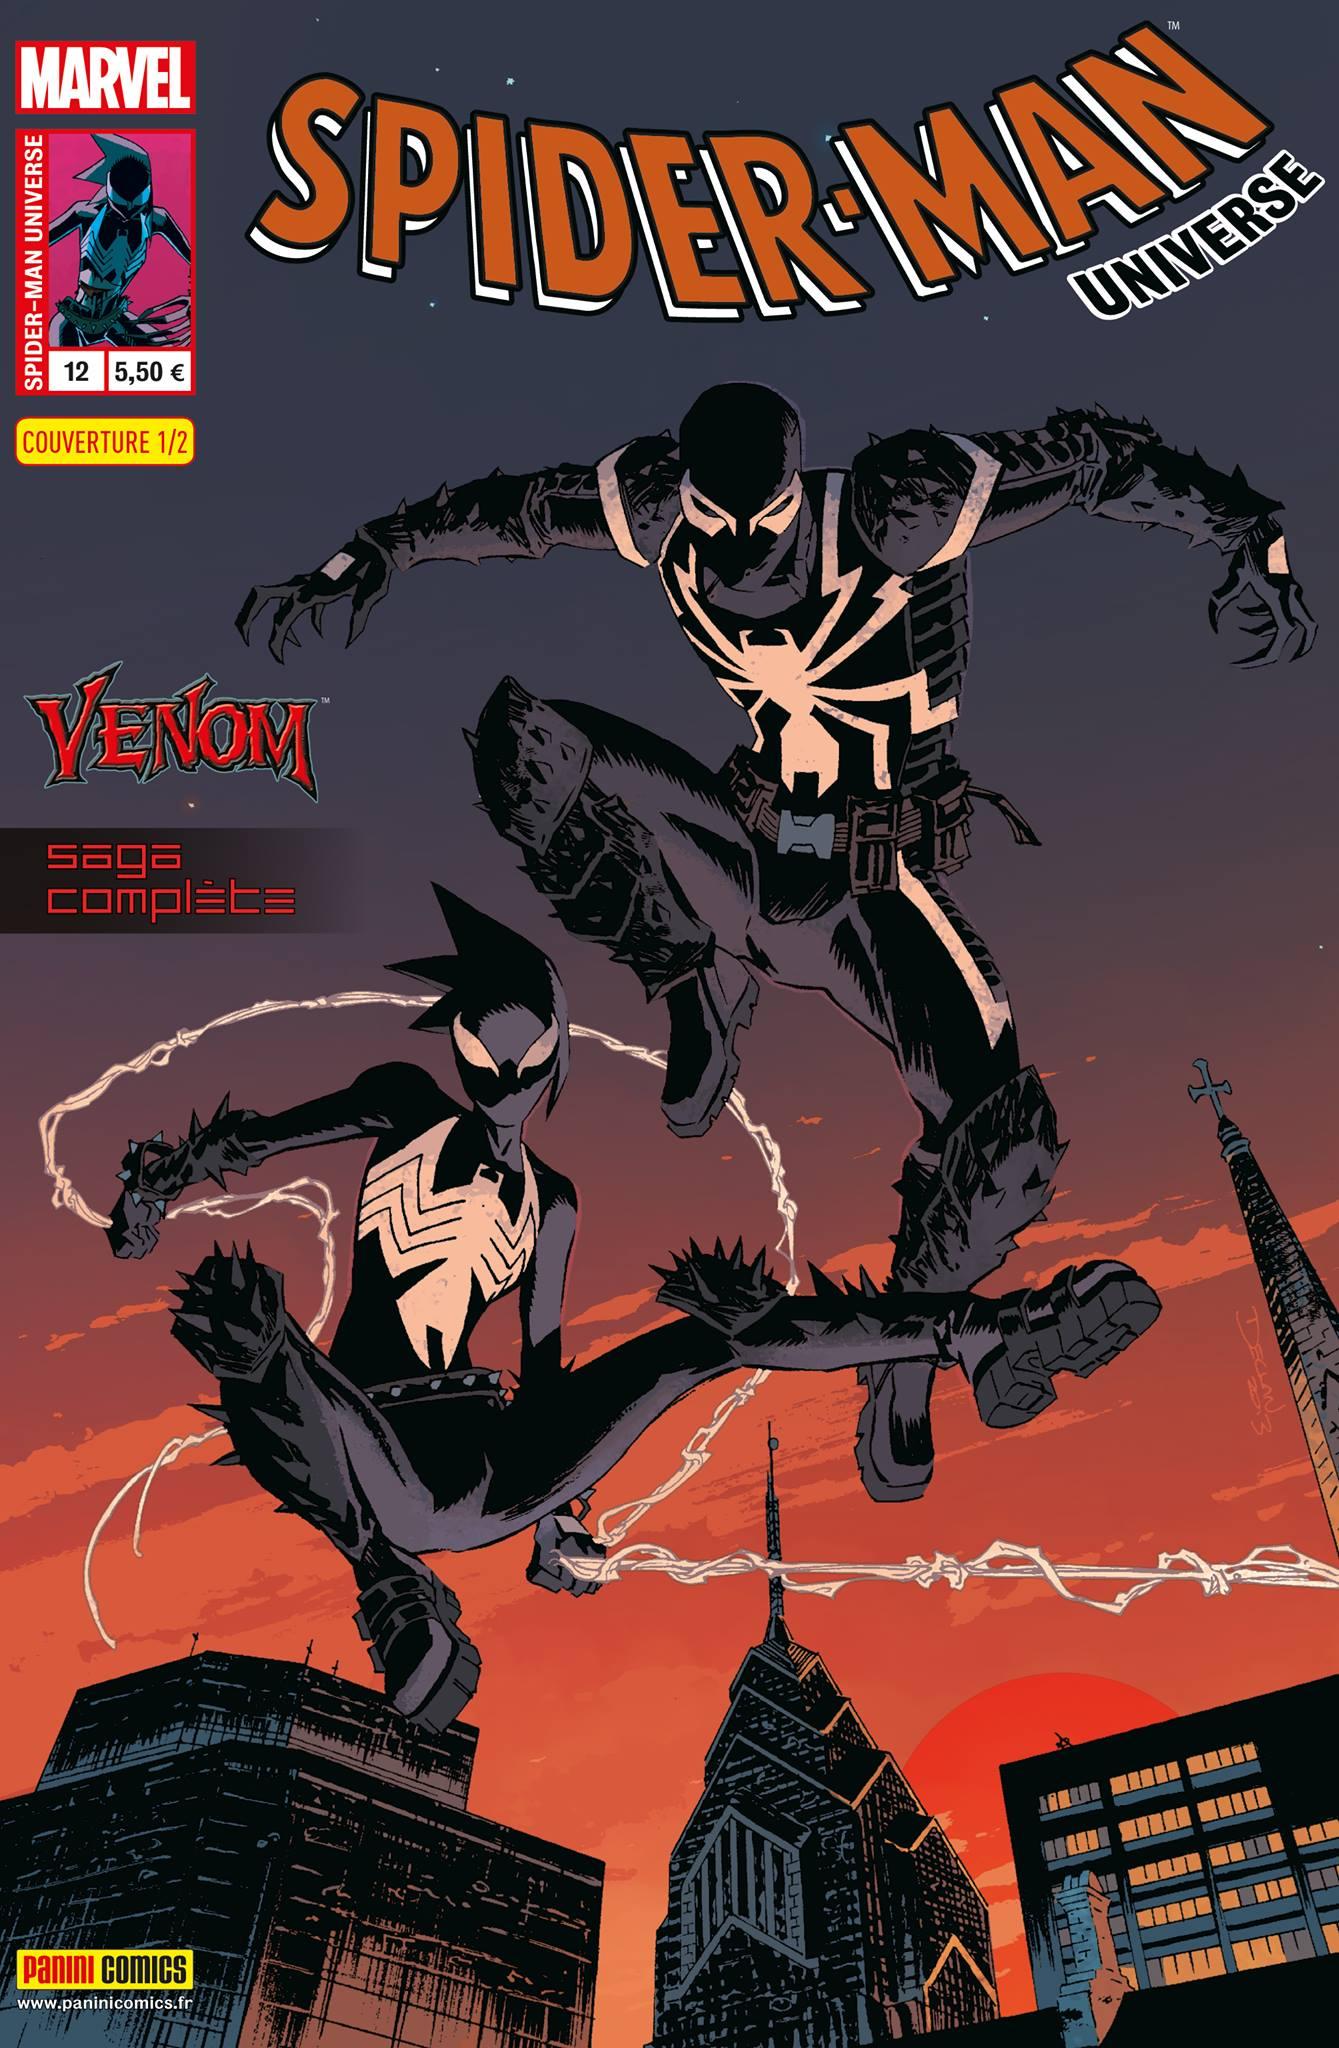 SPIDER-MAN UNIVERSE 12 : VENOM (Couv 1/2)